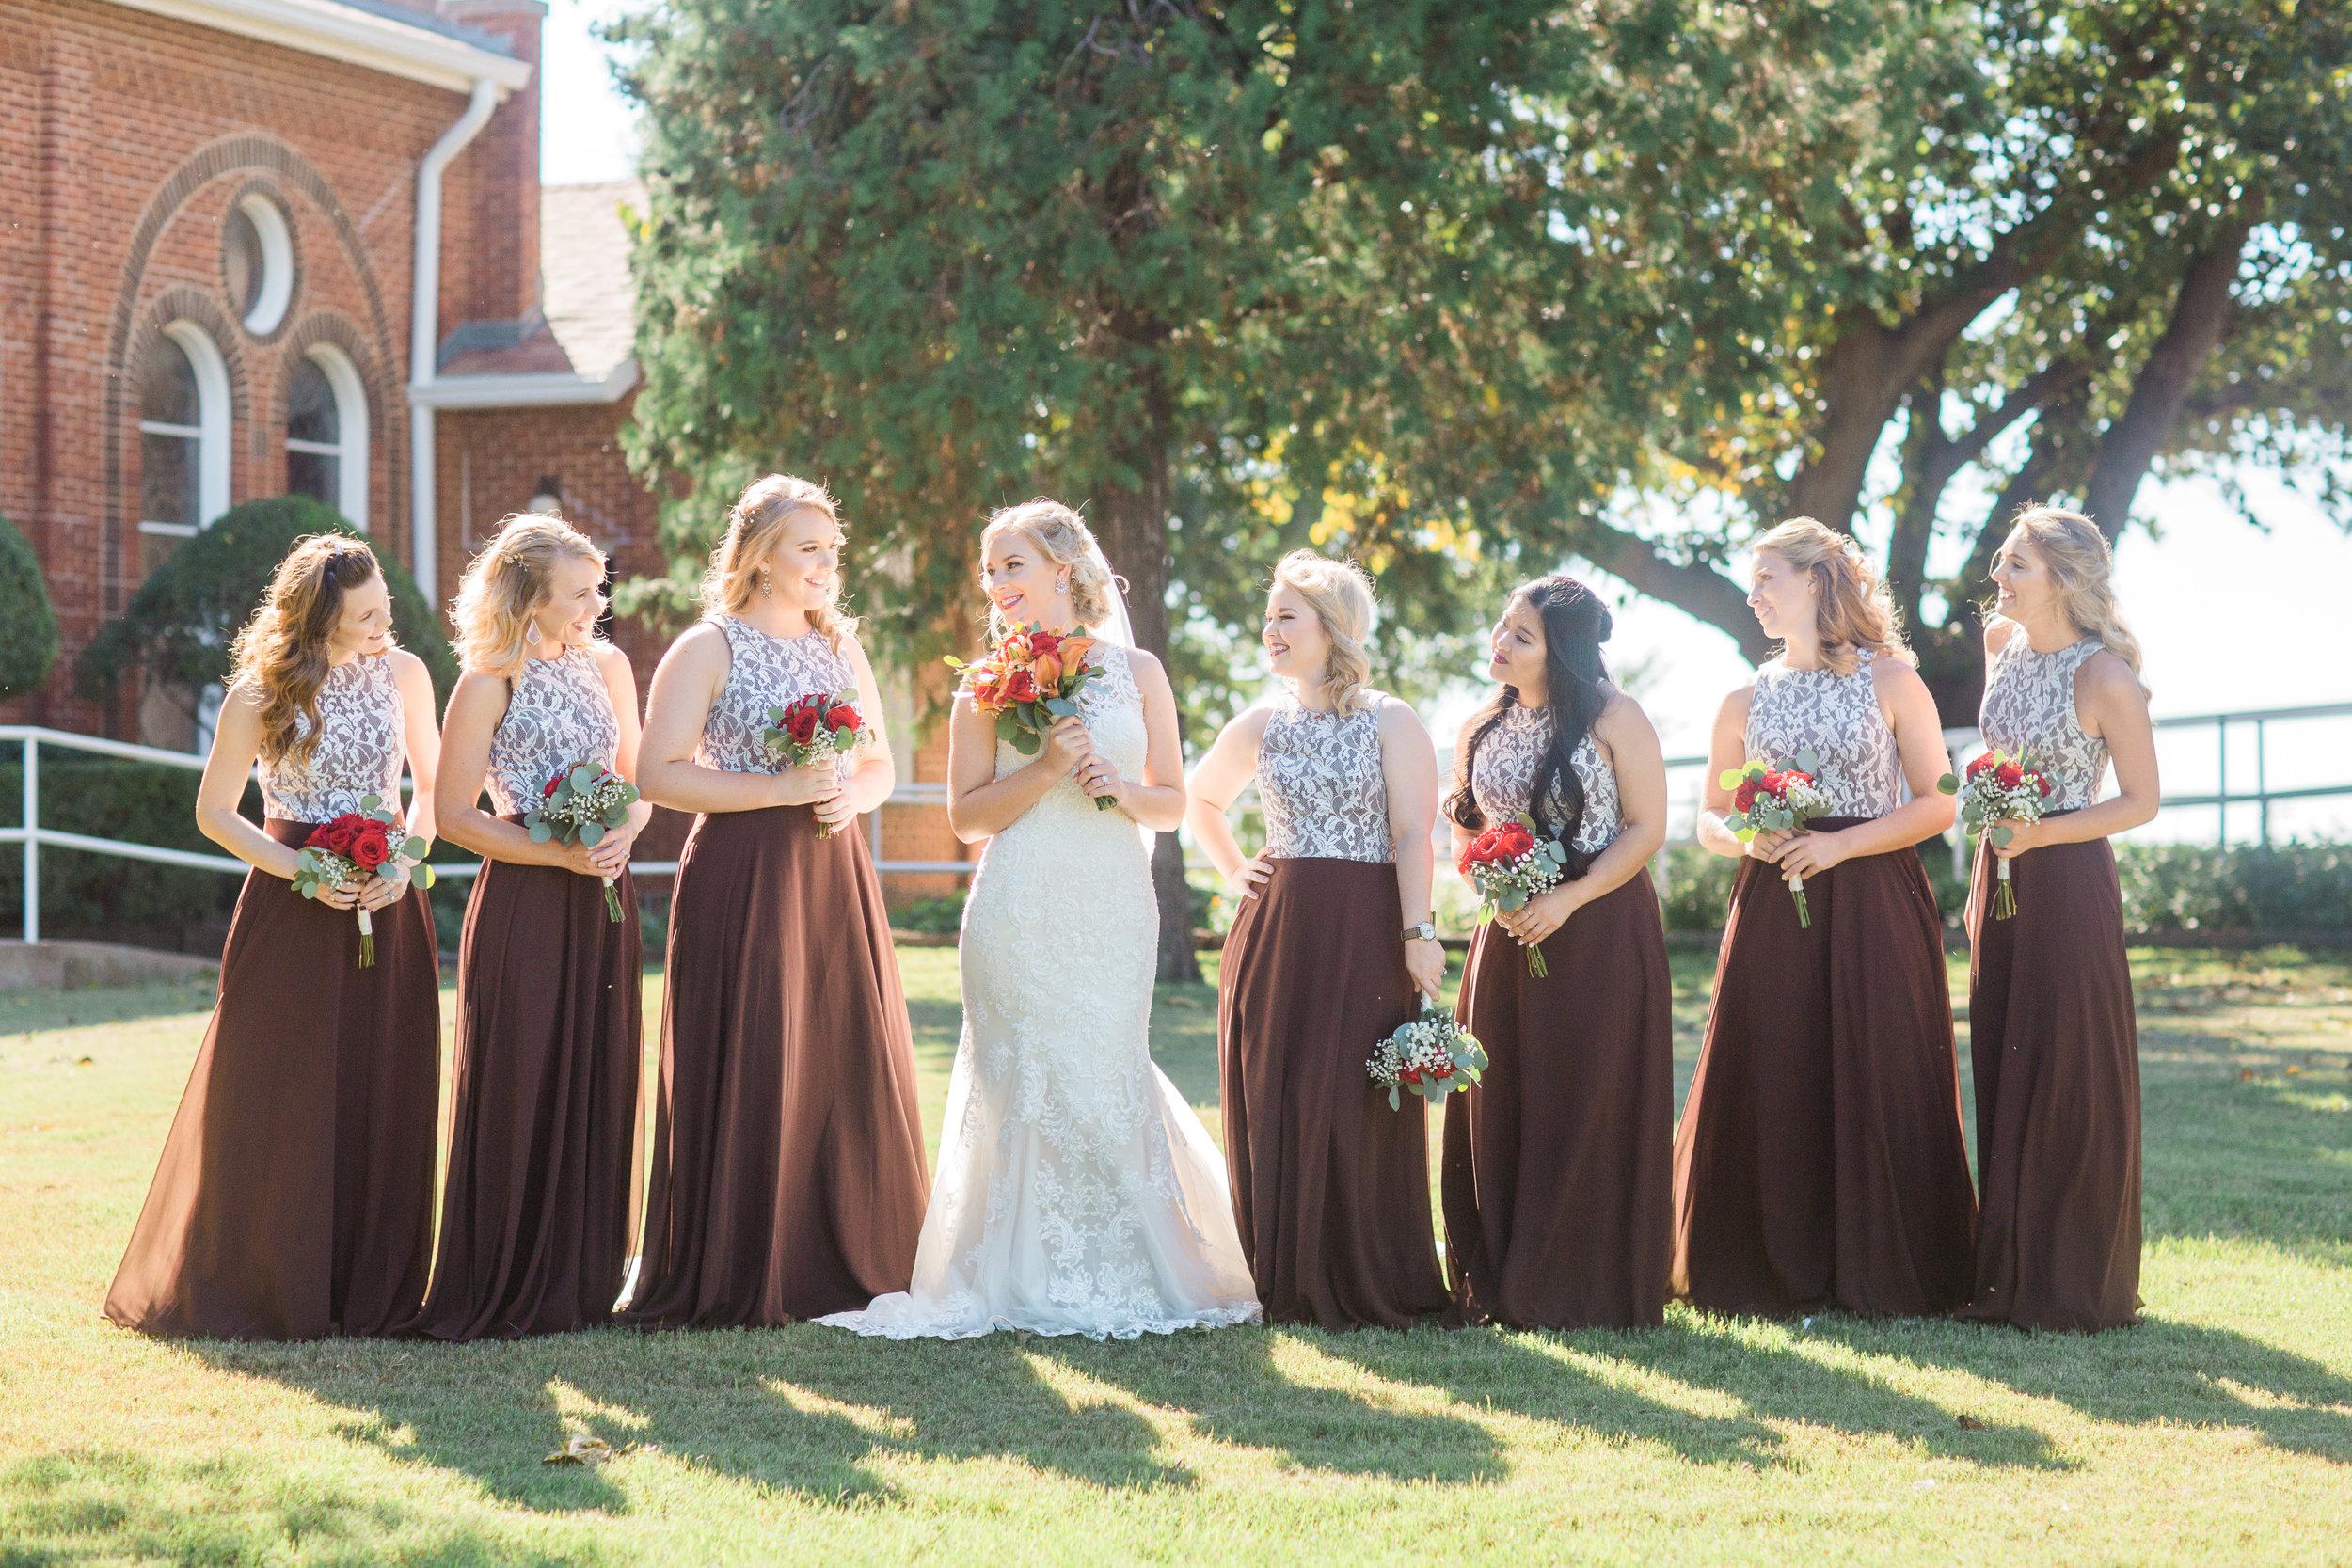 Bailey-Nathan-Windthorst-Texas-Wedding-022.jpg